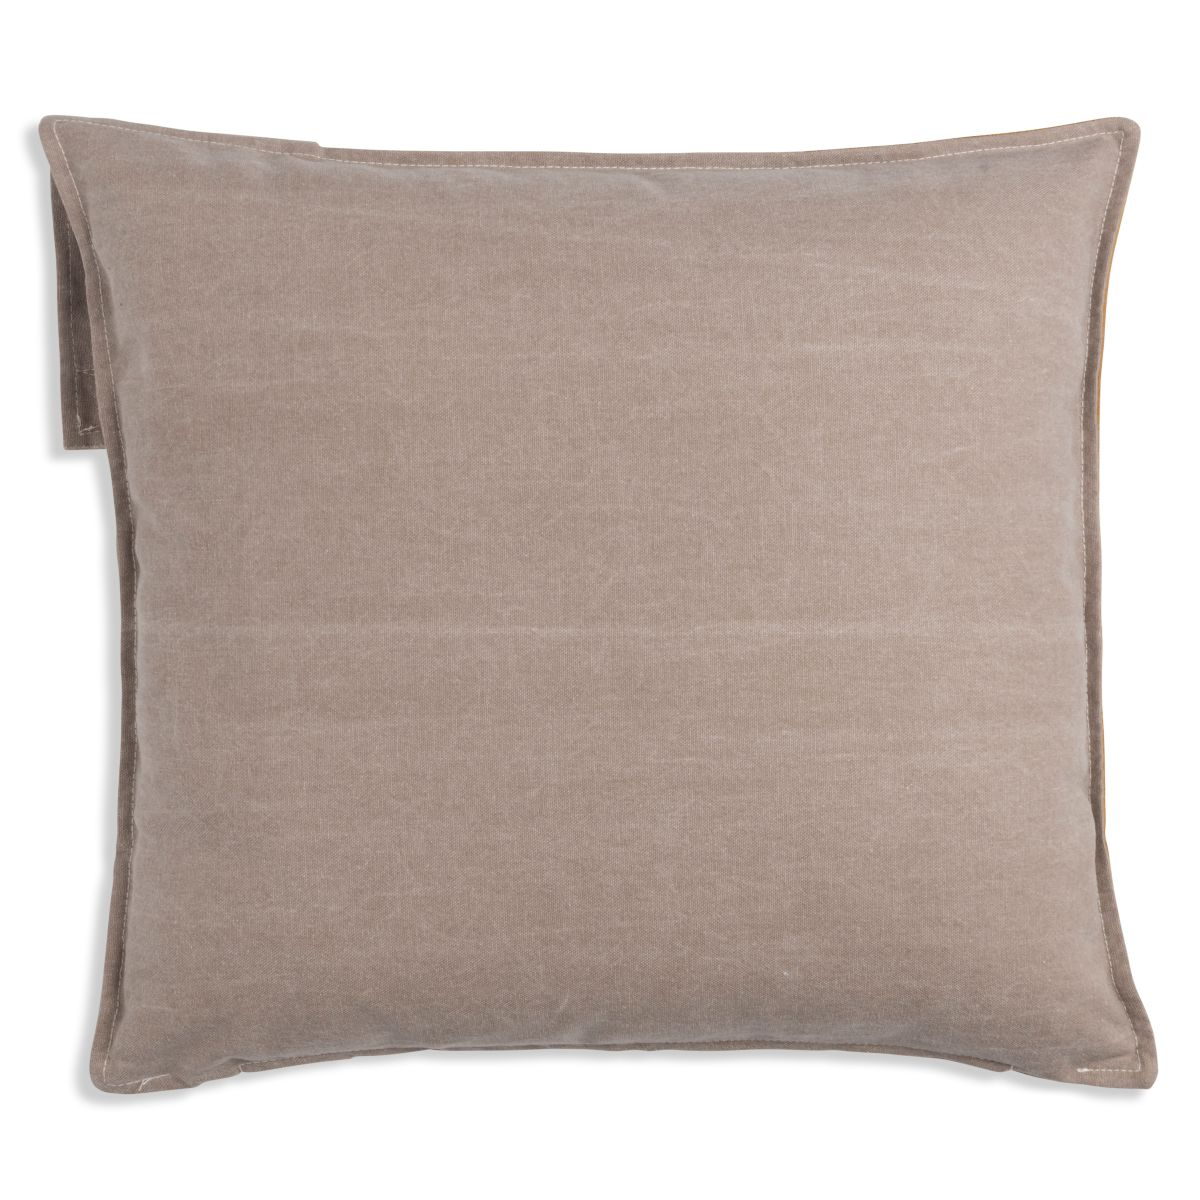 knit factory 1271212 kussen 50x50 luc beige 2